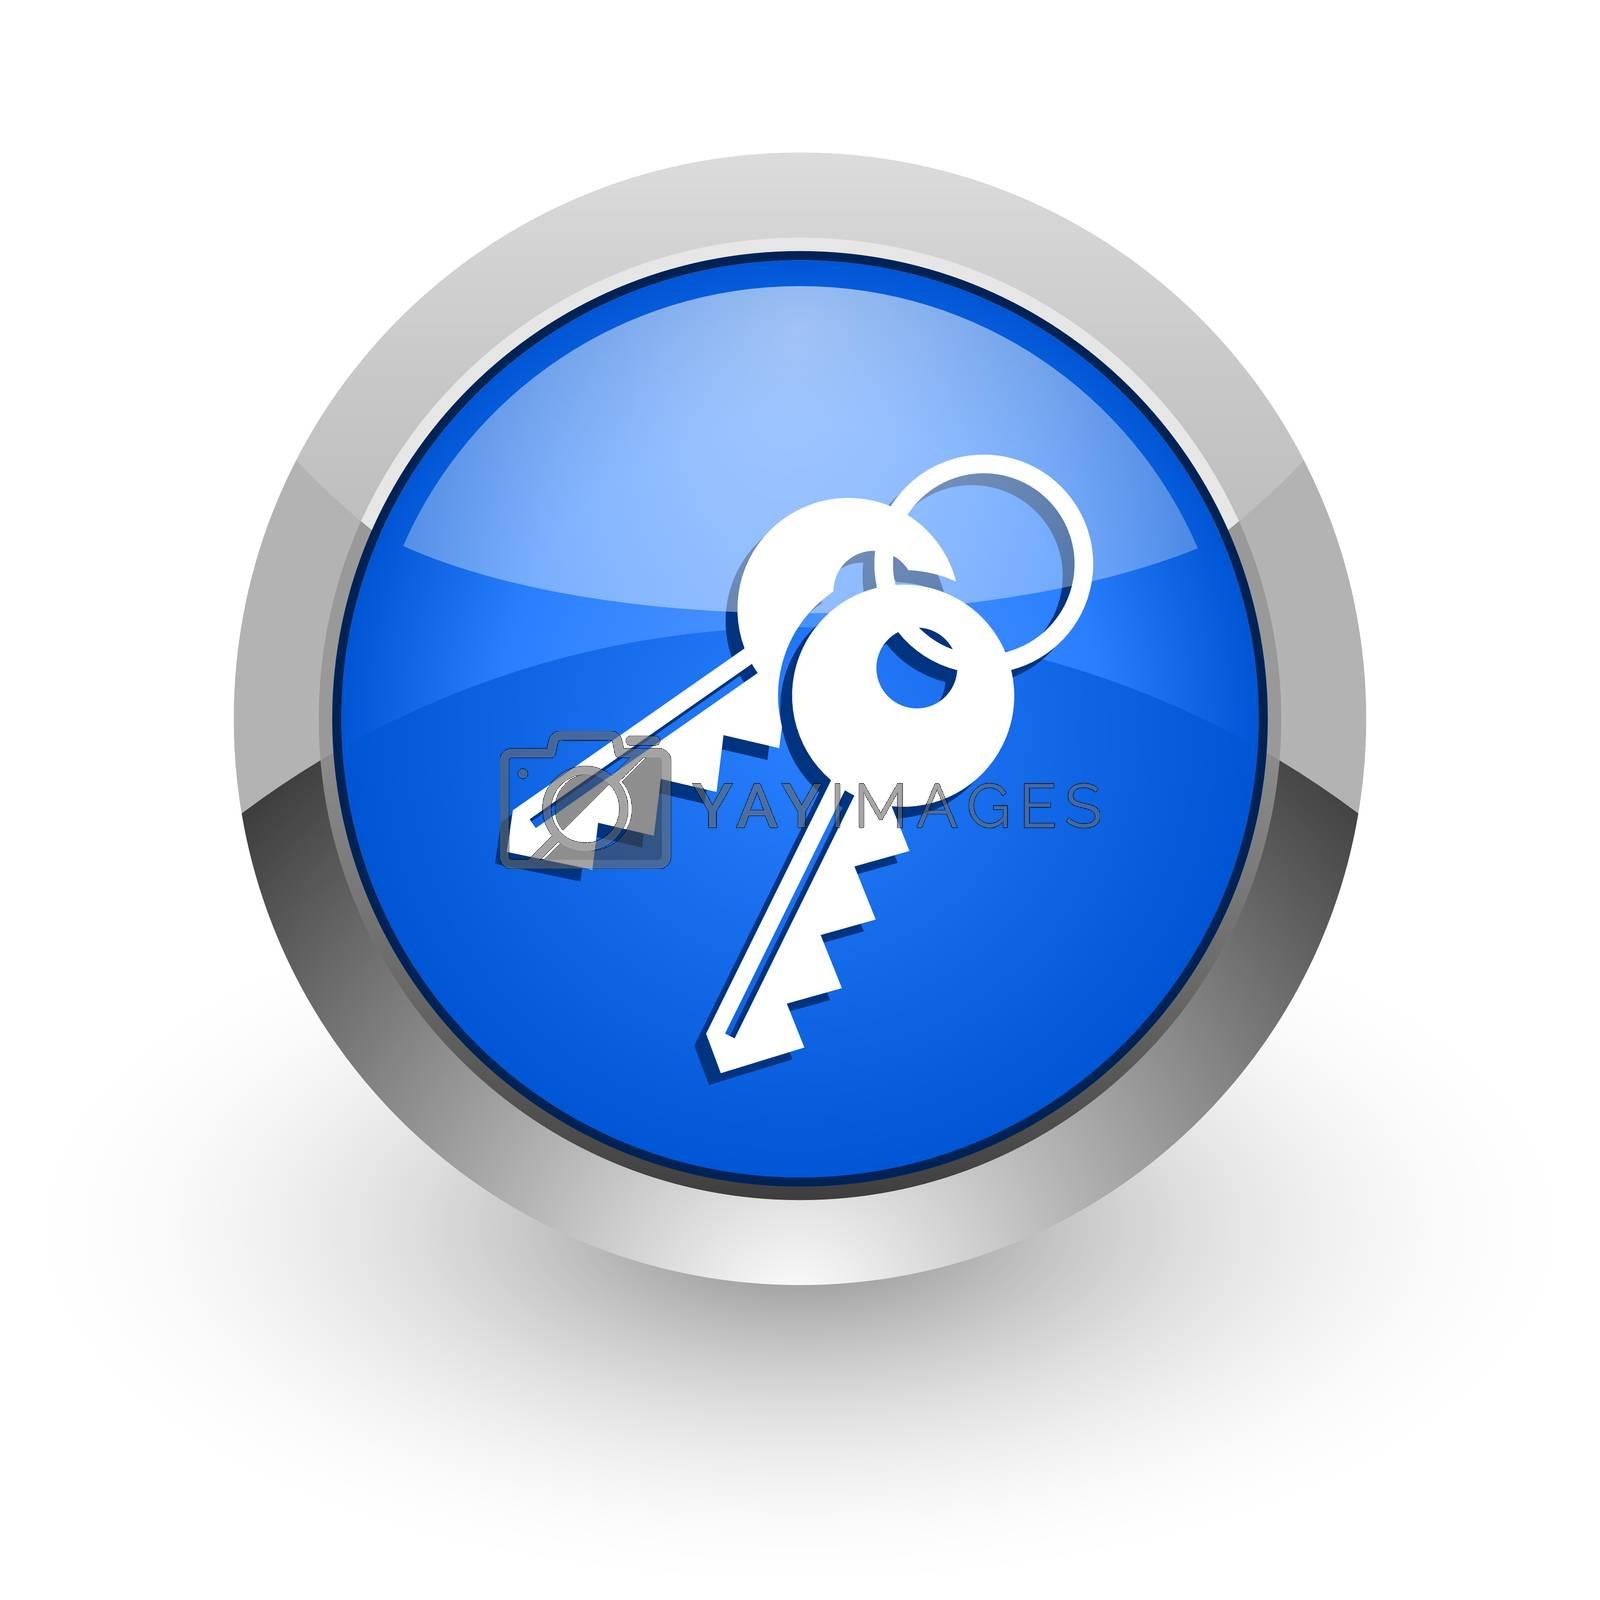 Royalty free image of keys blue glossy web icon by alexwhite